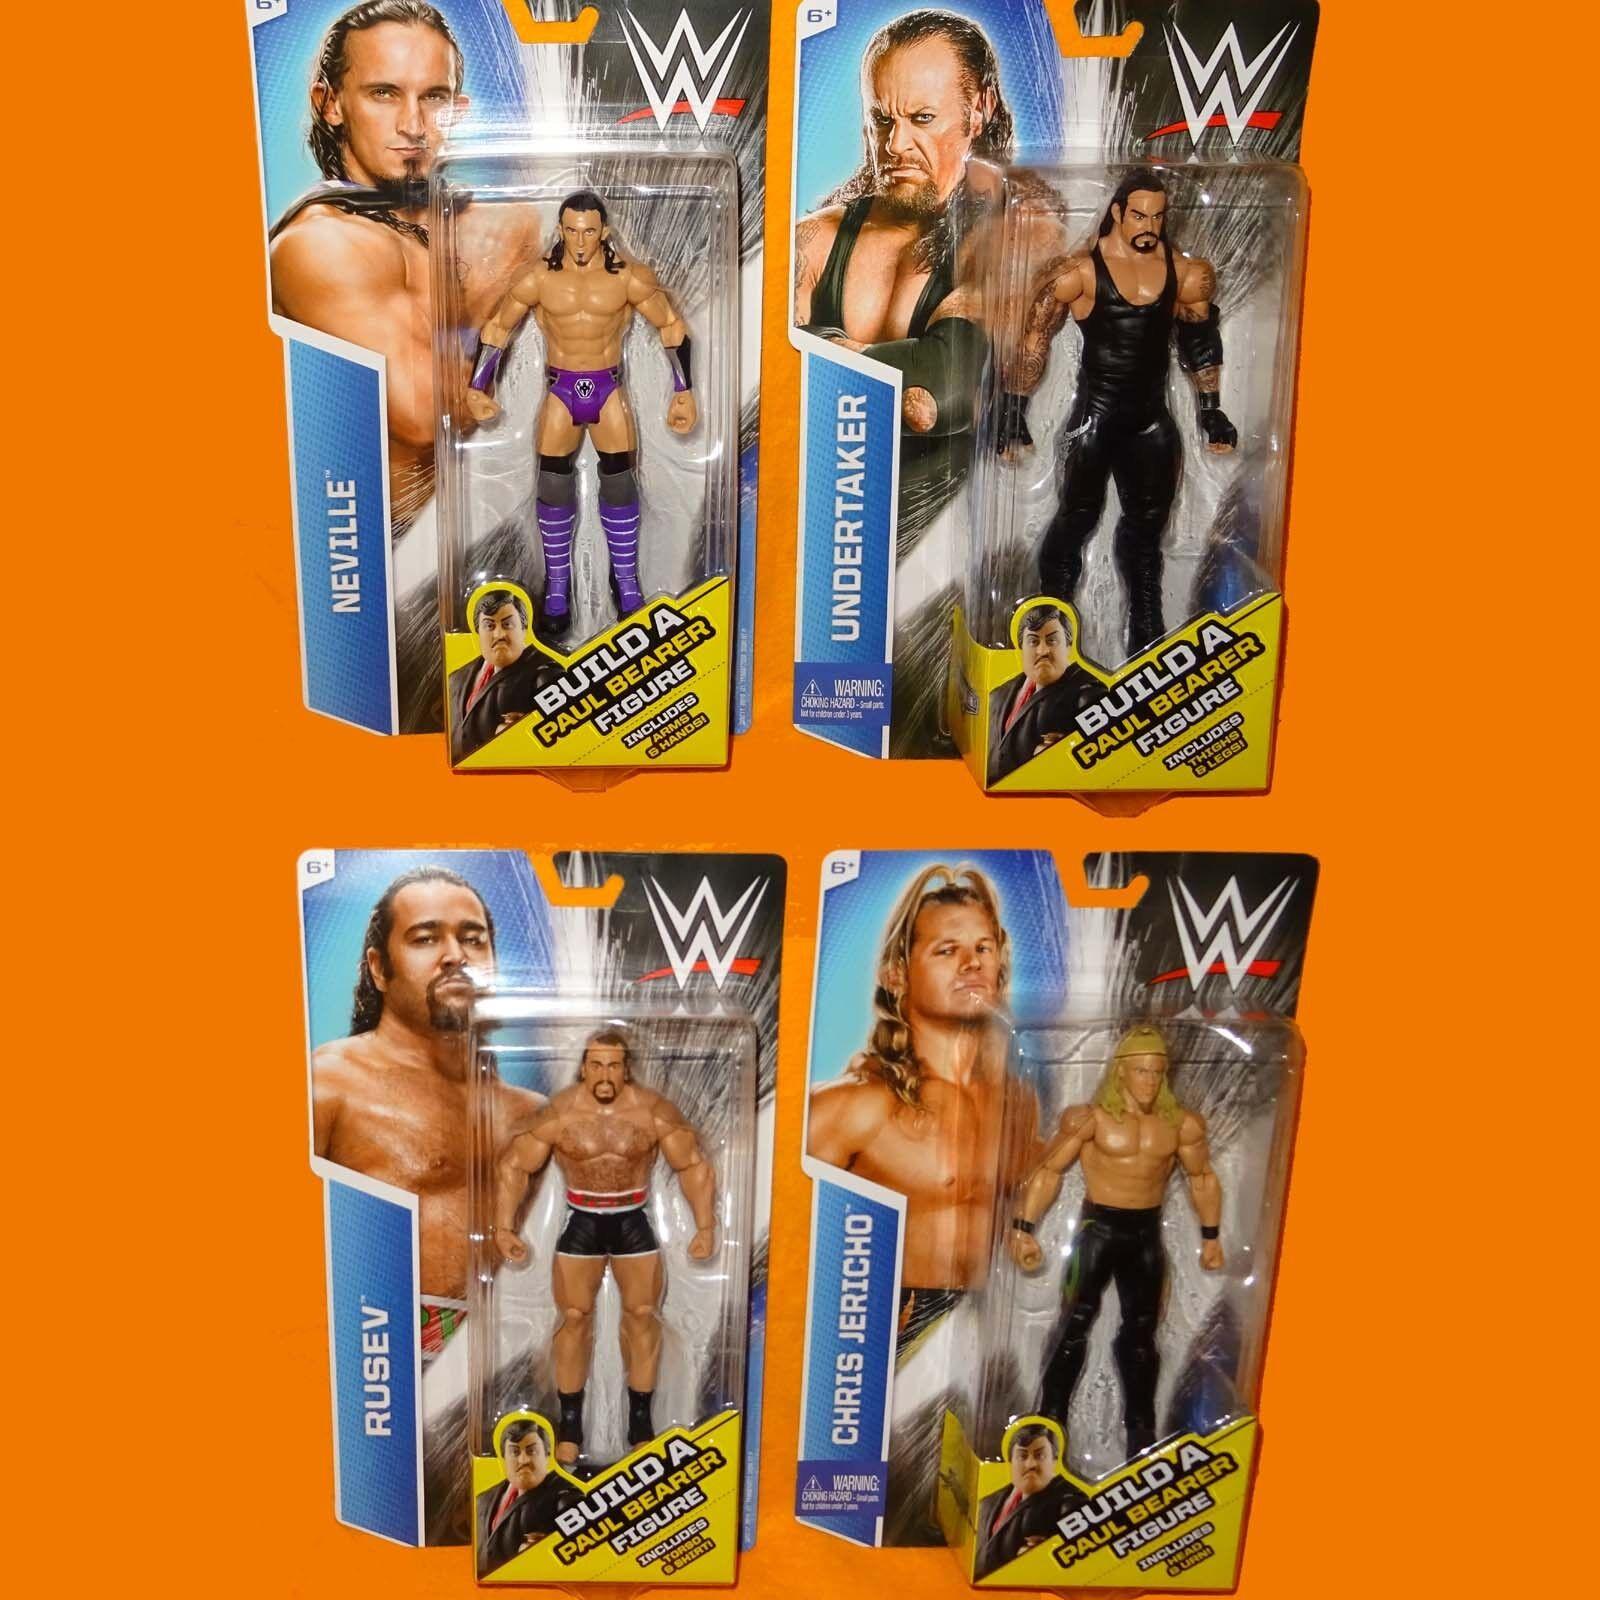 2015 MATTEL WWE WRESTLING WRESTLEMANIA 22 FIGURES COMPLETE LOT MOC CARDED NEW